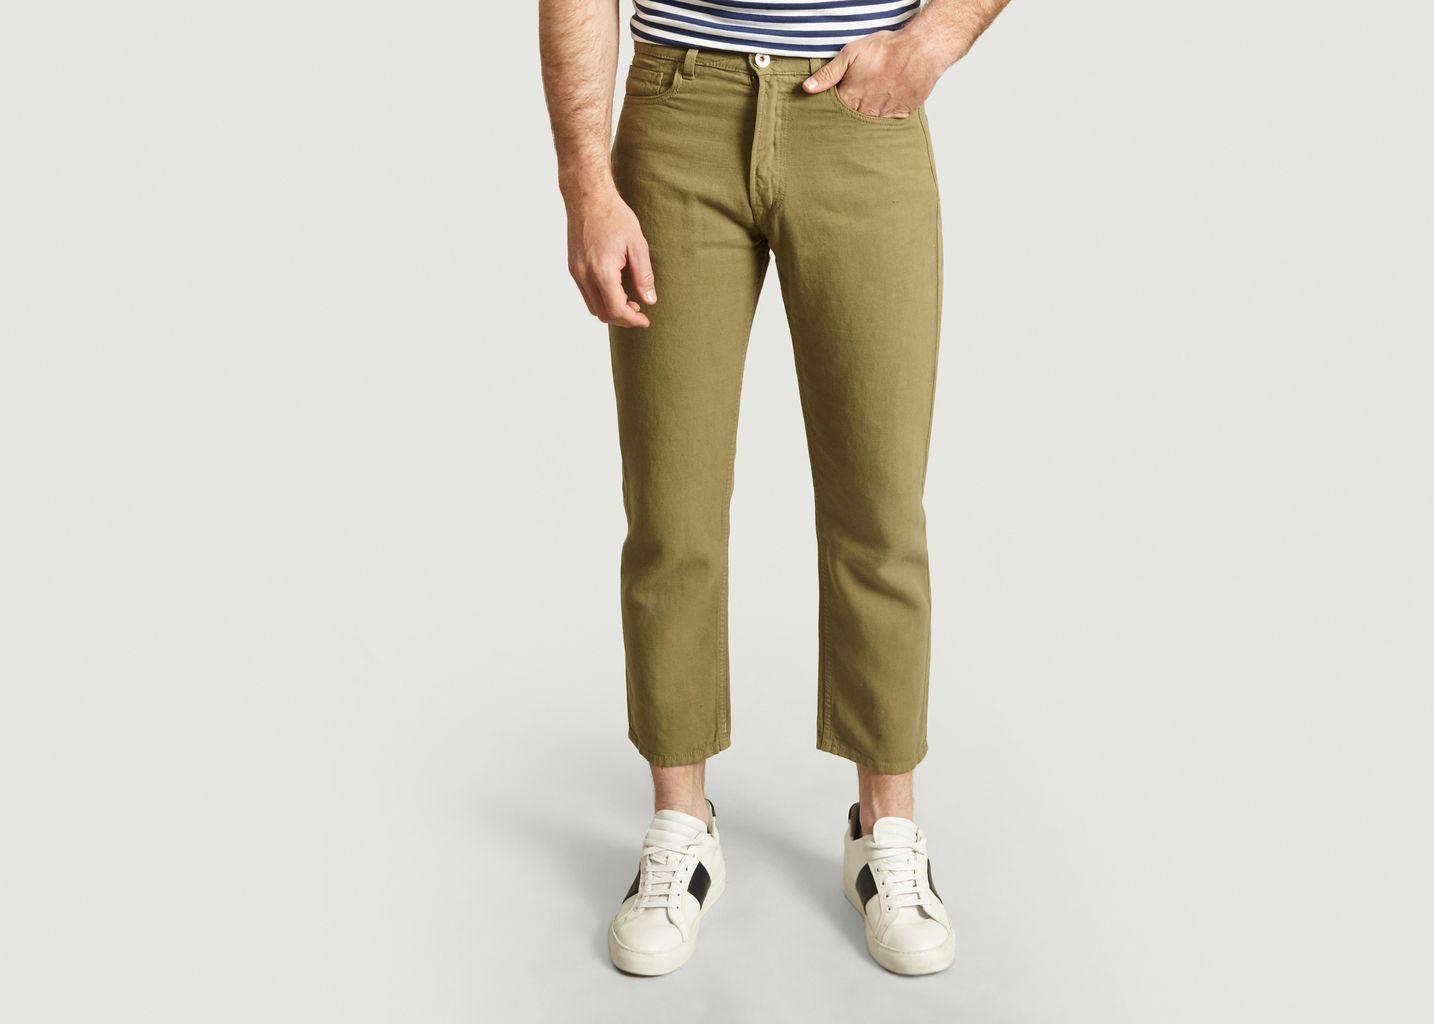 Pantalon Alva coupe skateur - YMC